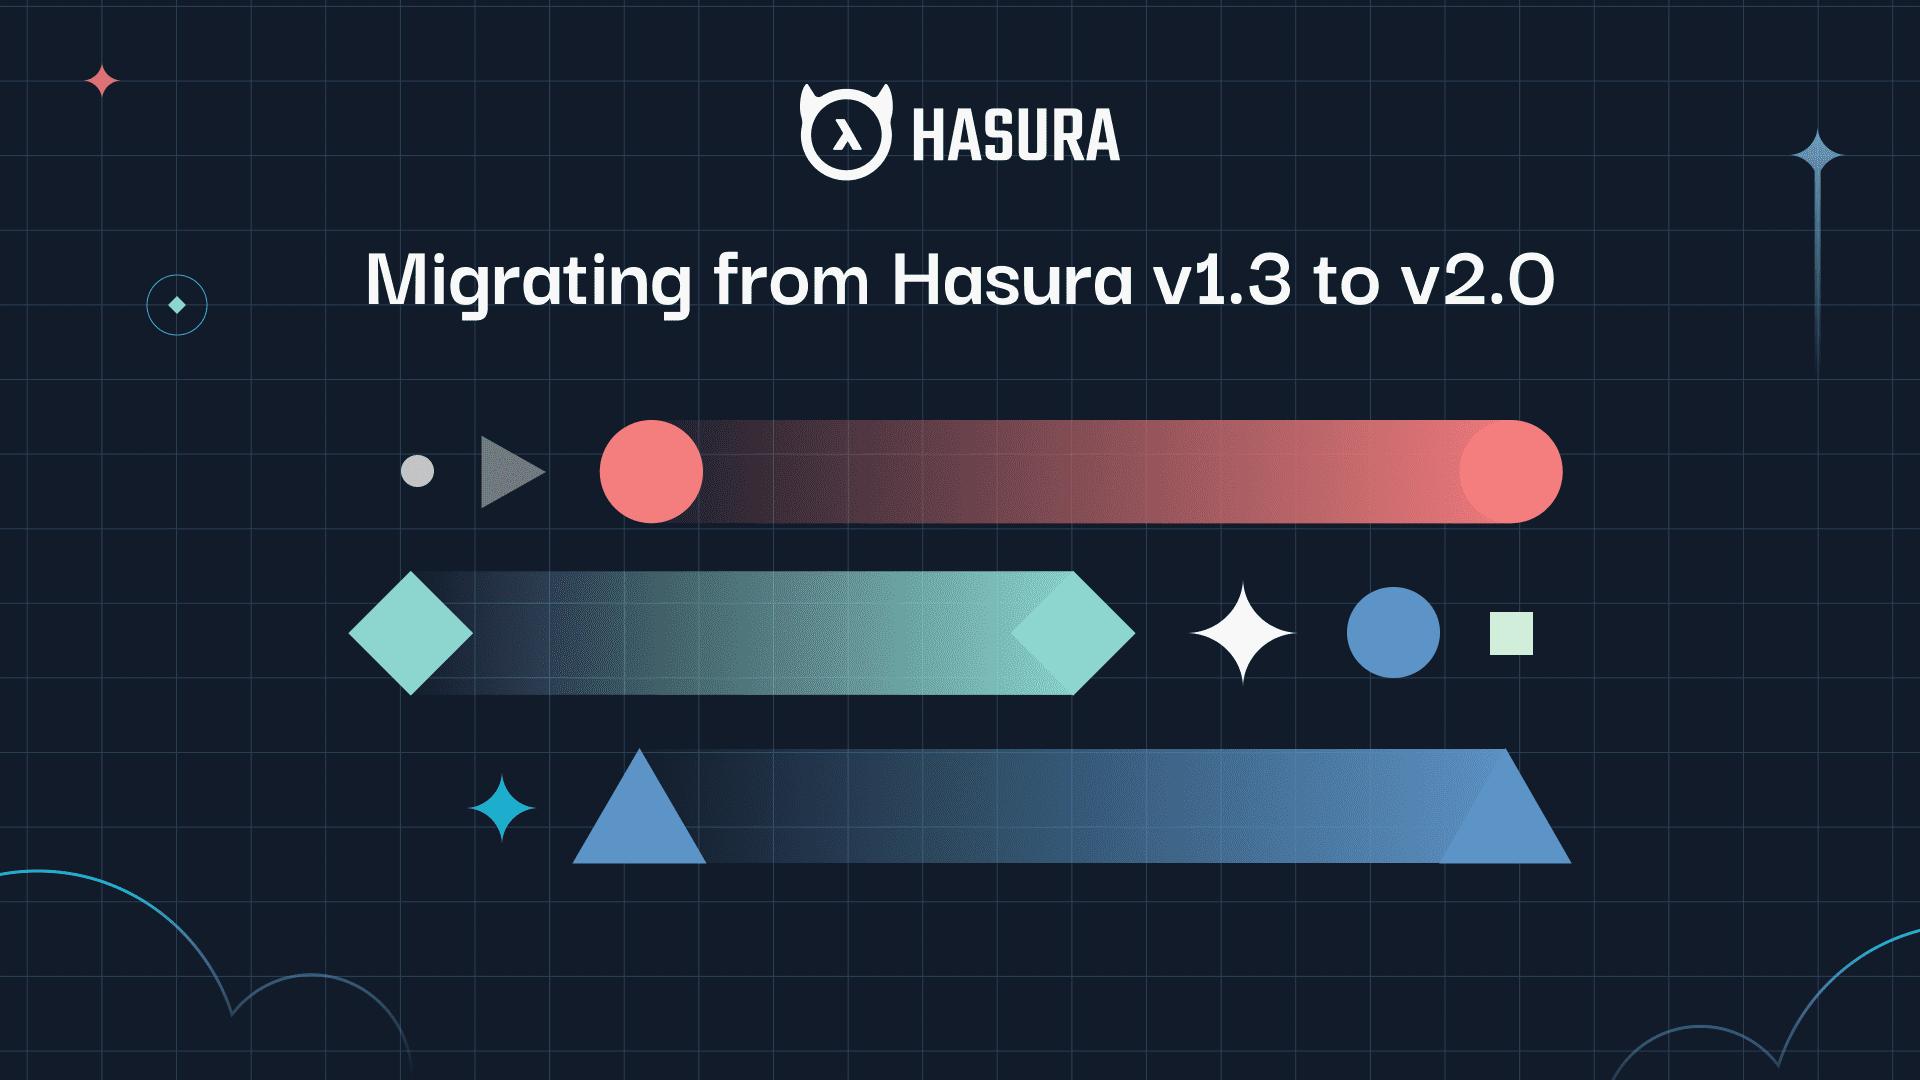 Migrating from Hasura v1.3 to v2.0